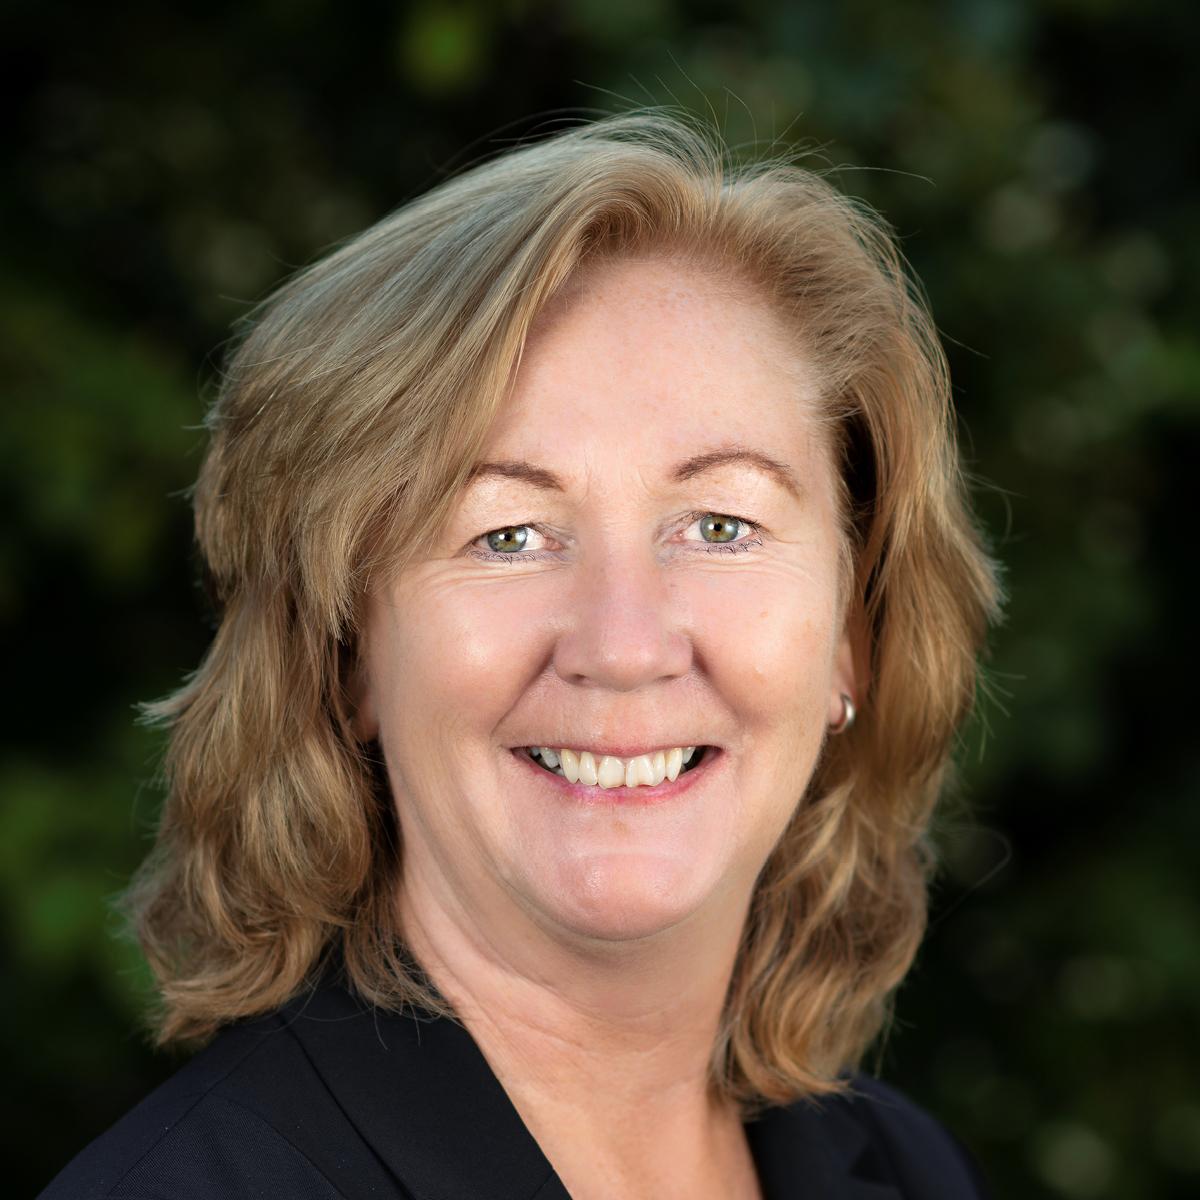 Konsernledelse, HR Director, Hanne Buje Jensen